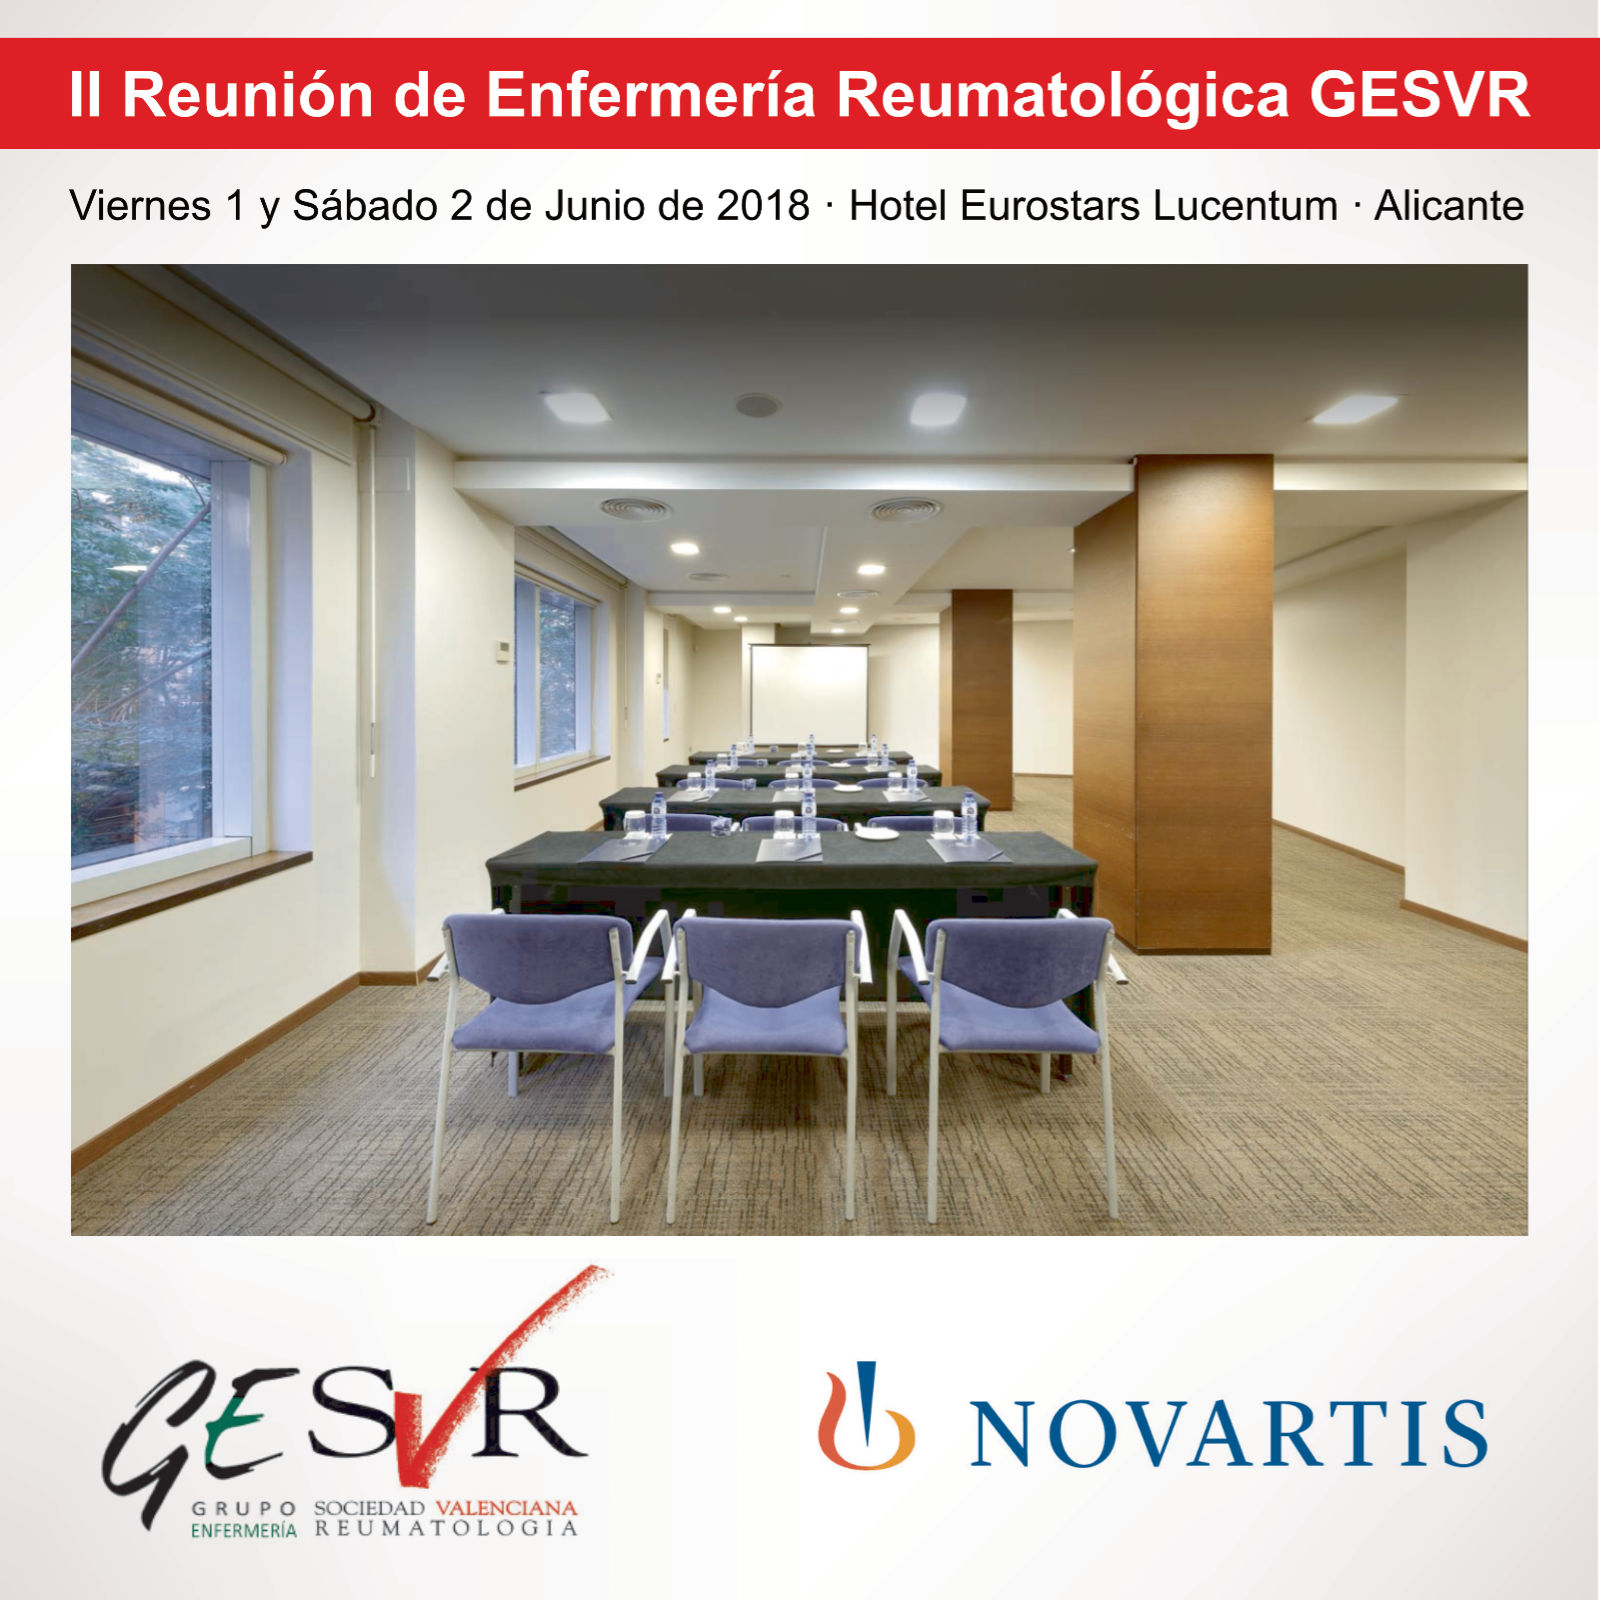 II Reunión de Enfermería Reumatológica GESVR